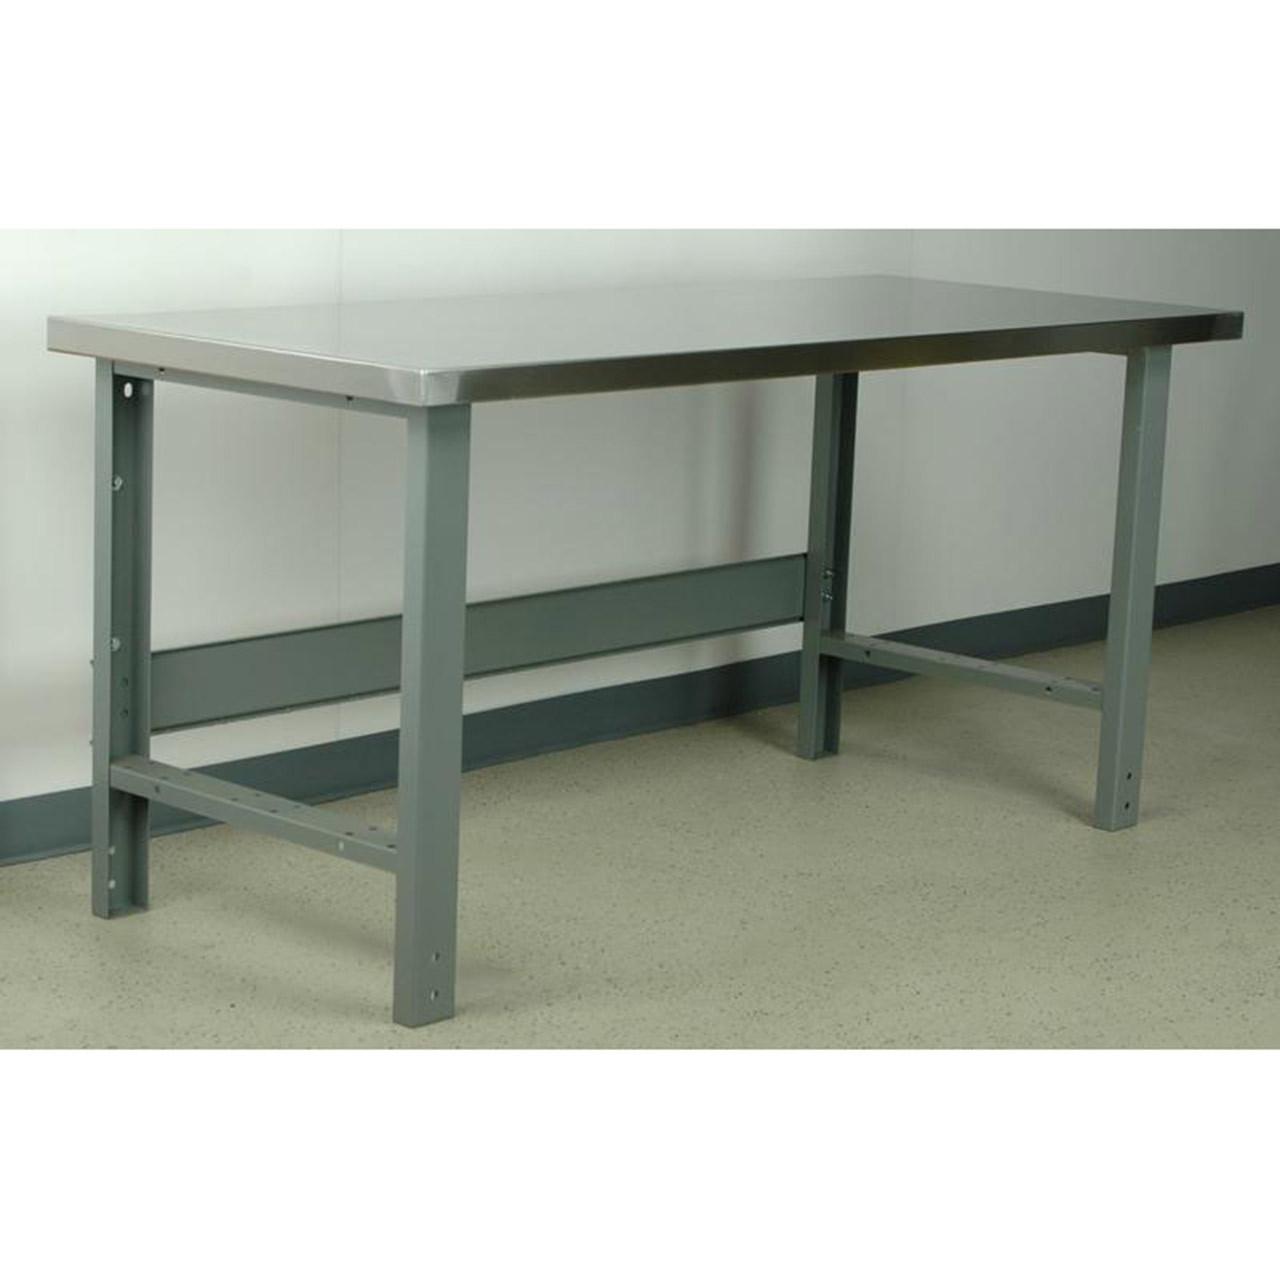 Standard Industrial Workbench Stainless Steel